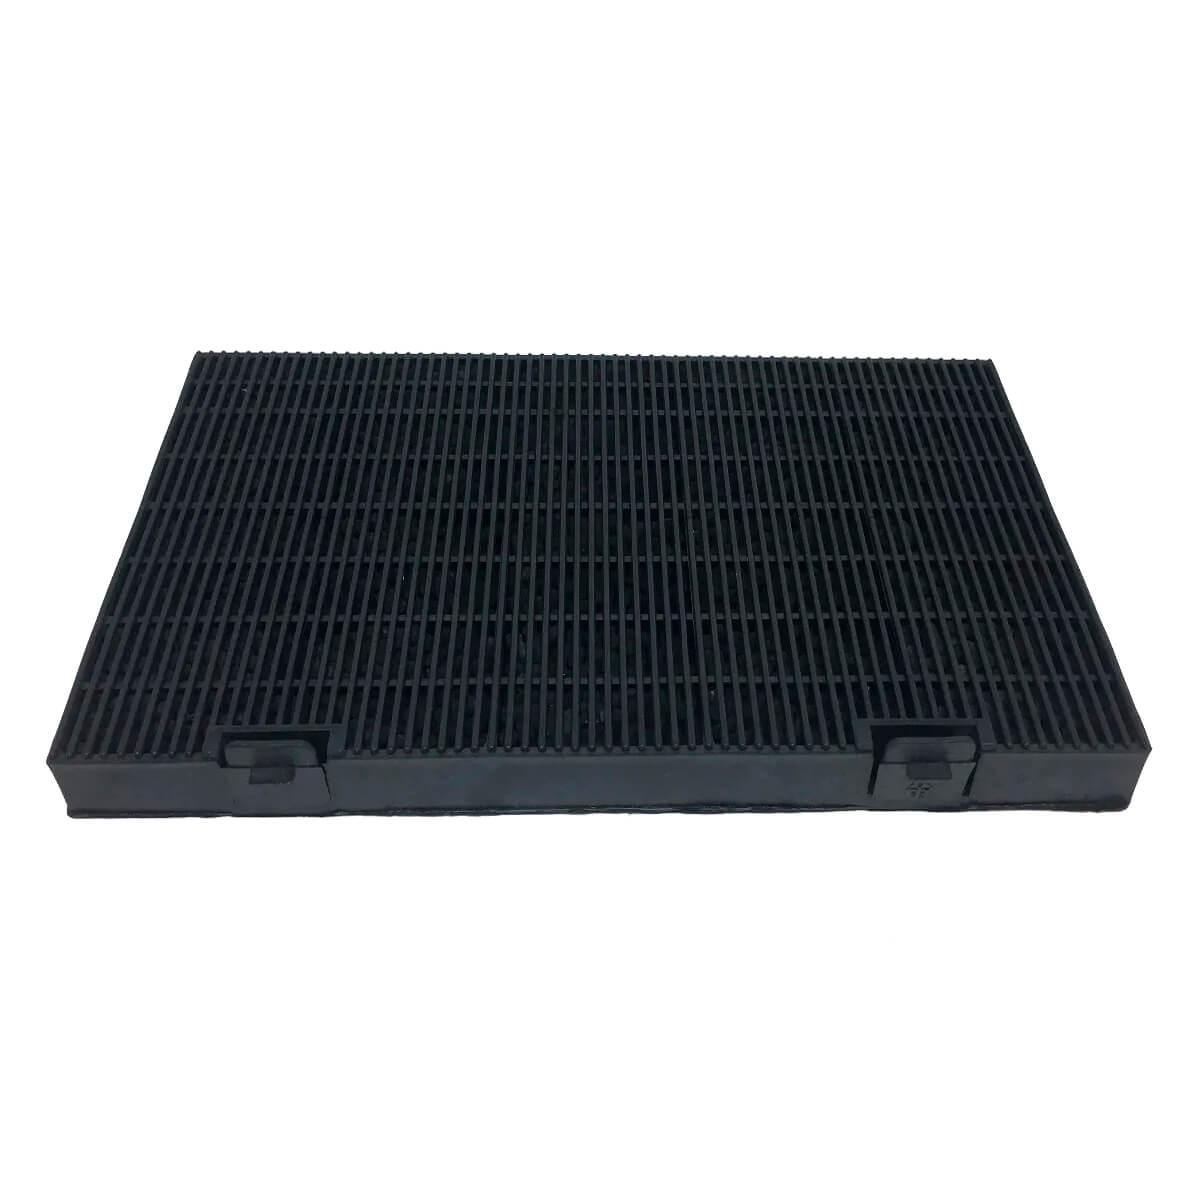 Filtro De Carvão Ativado Para Coifa Electrolux 90BS - 31335002